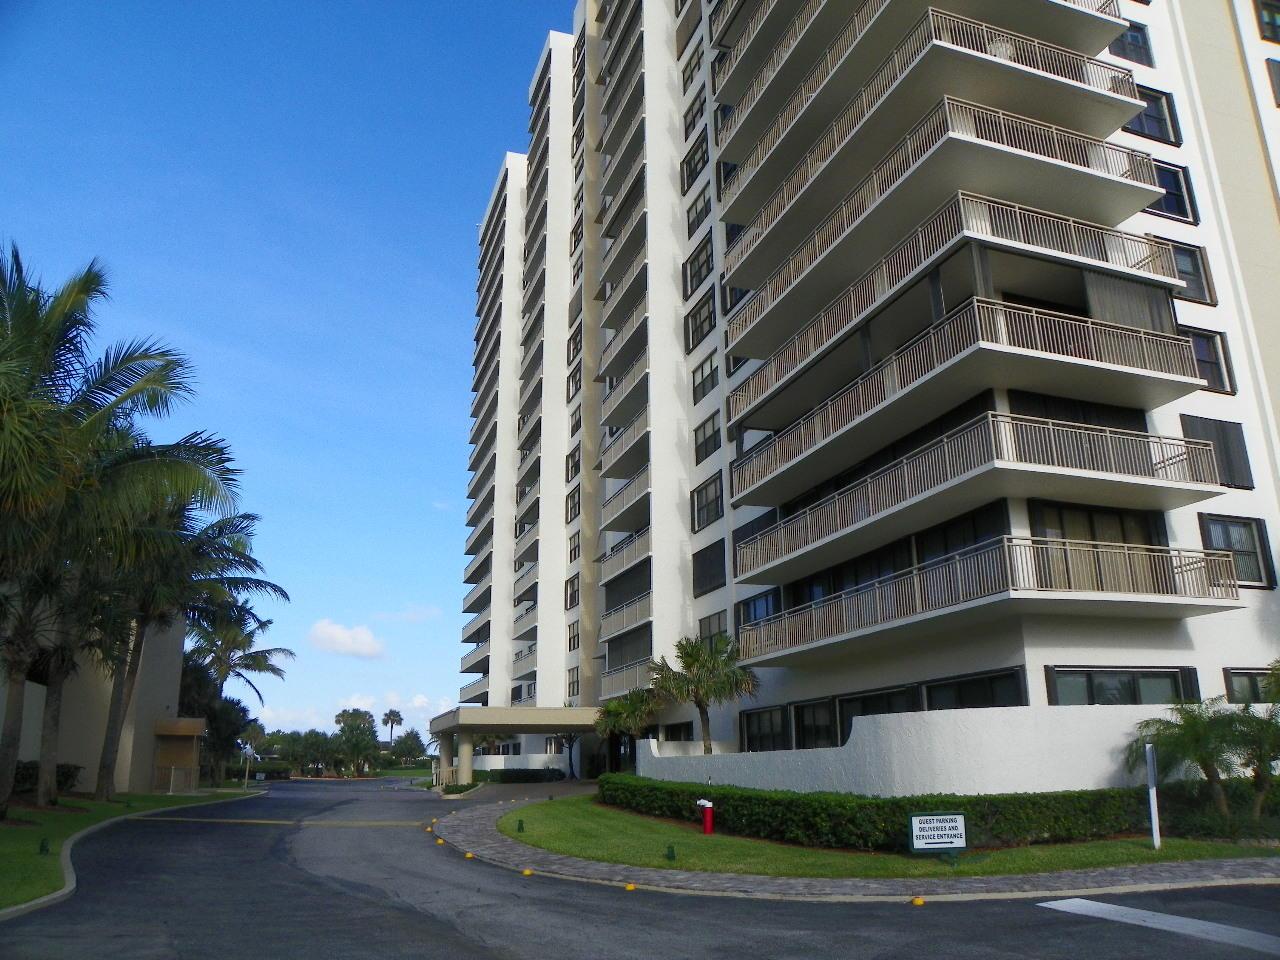 3400 Ocean Drive, Riviera Beach, Florida 33404, 2 Bedrooms Bedrooms, ,2 BathroomsBathrooms,Condo/Coop,For Rent,Oceantree,Ocean,12,RX-10491005